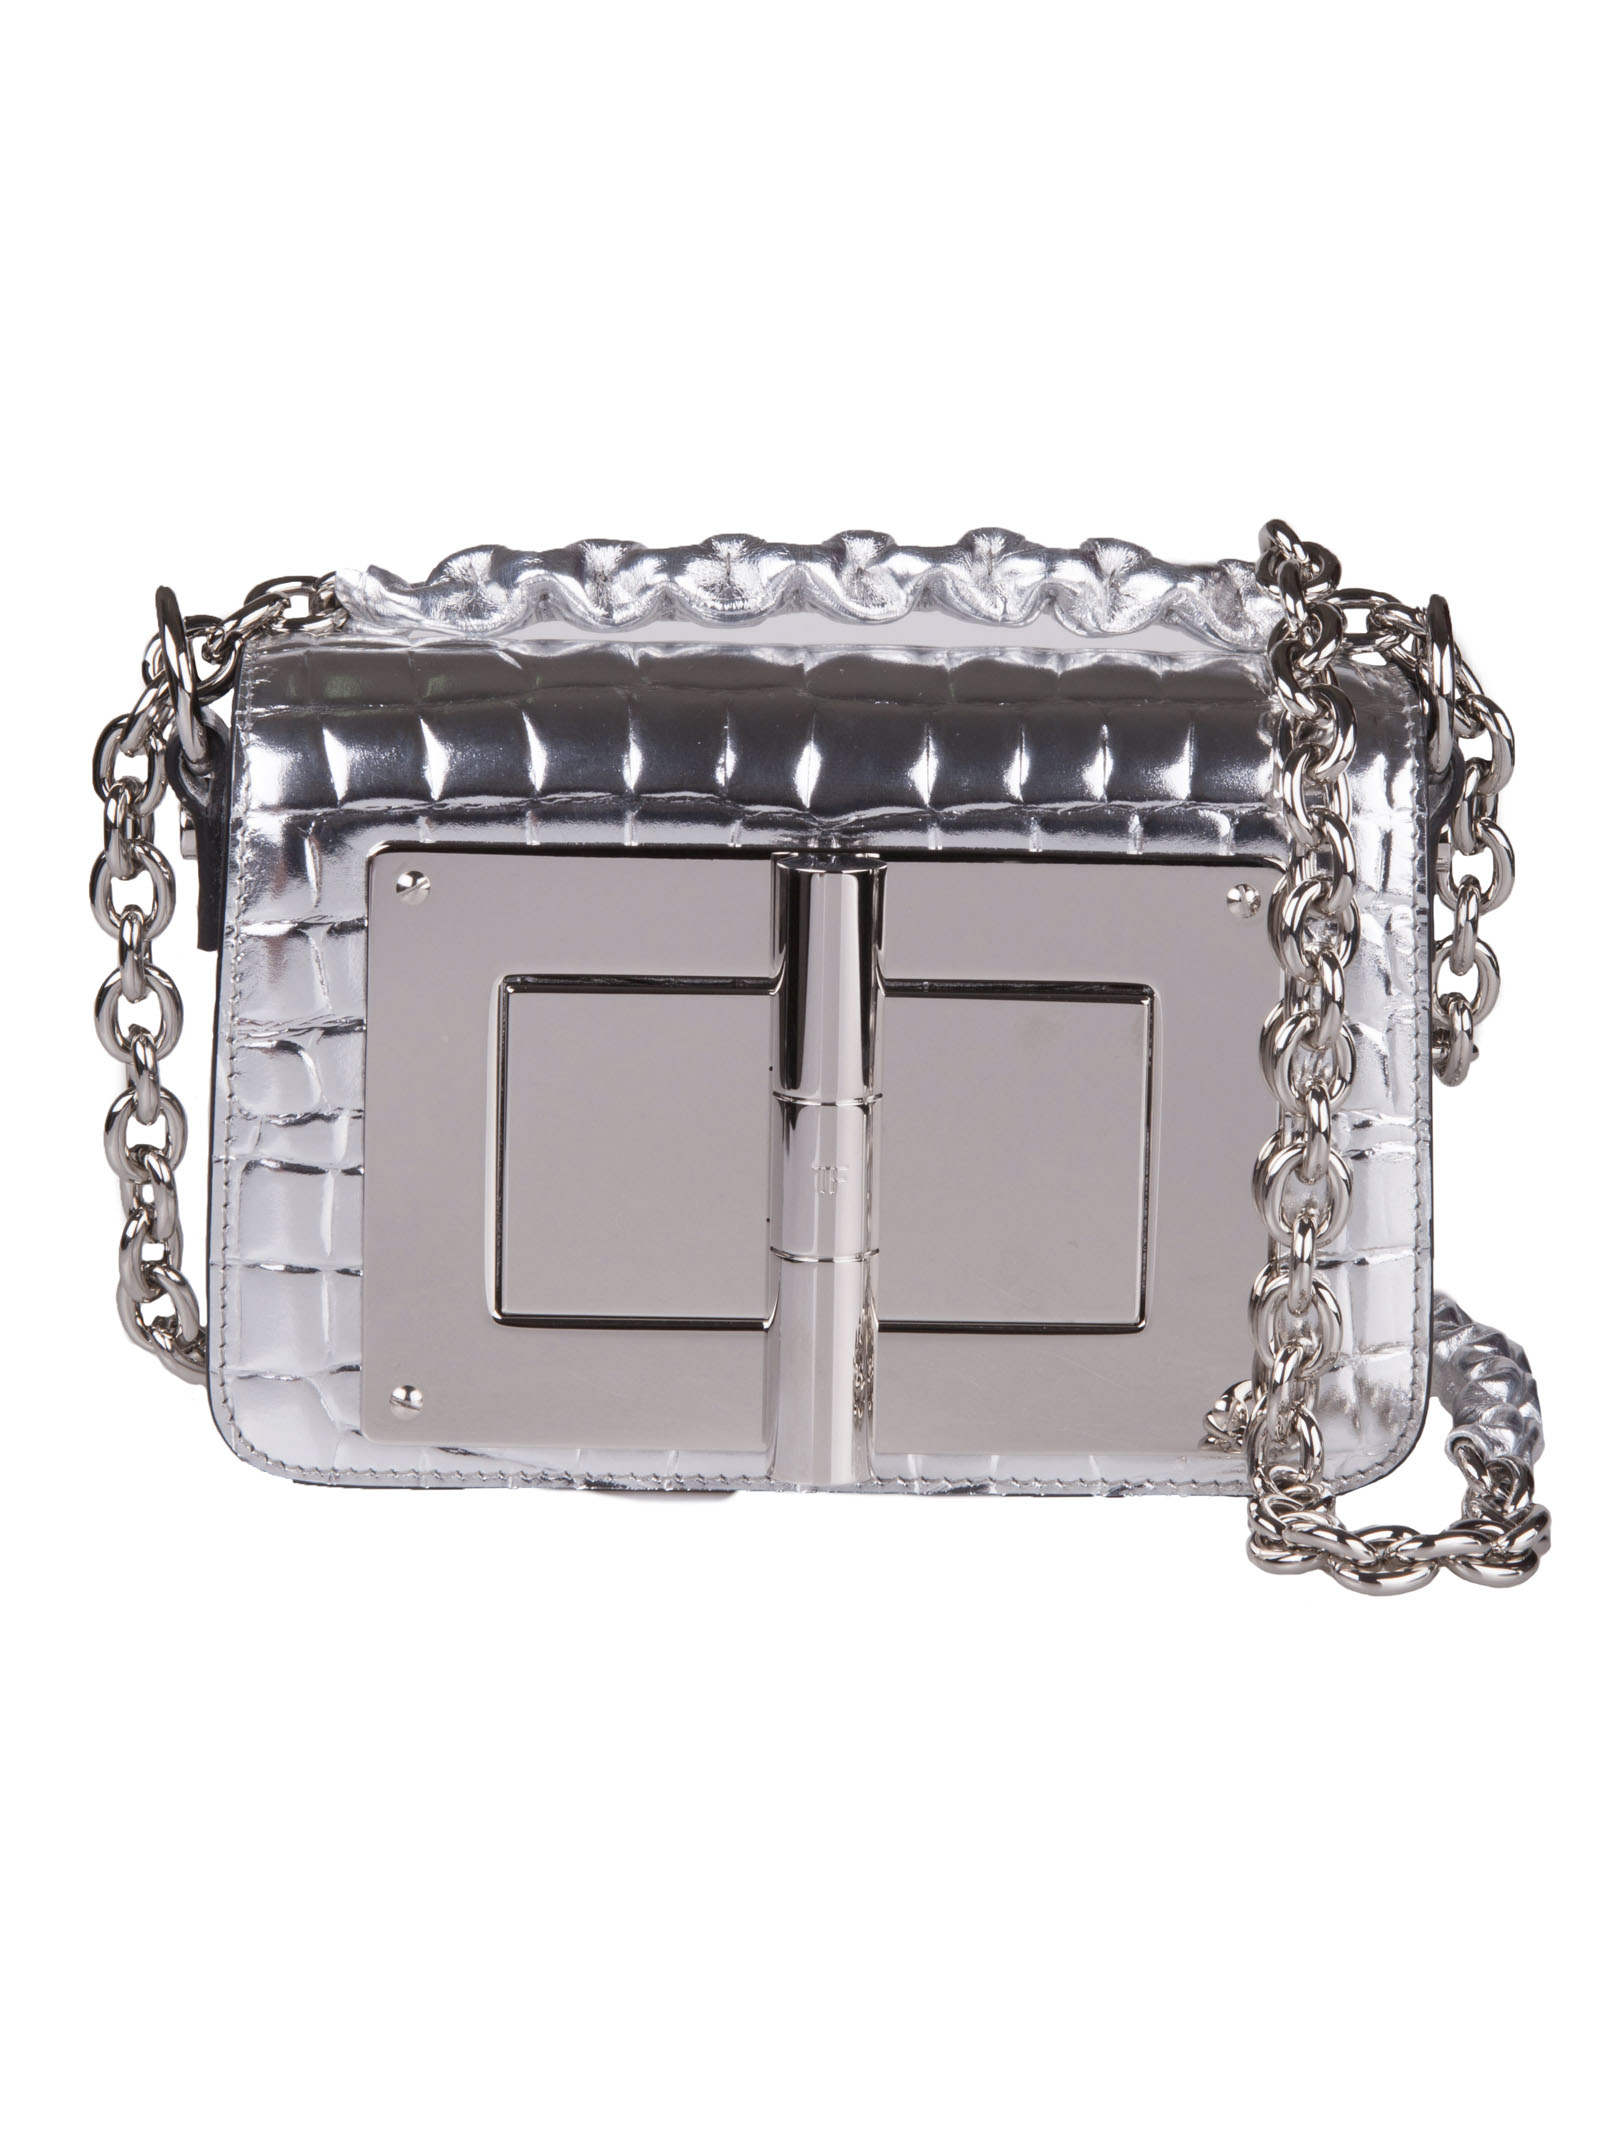 Tom Ford shoulder bag - Tom Ford - Michele Franzese Moda 75d9b8912b338